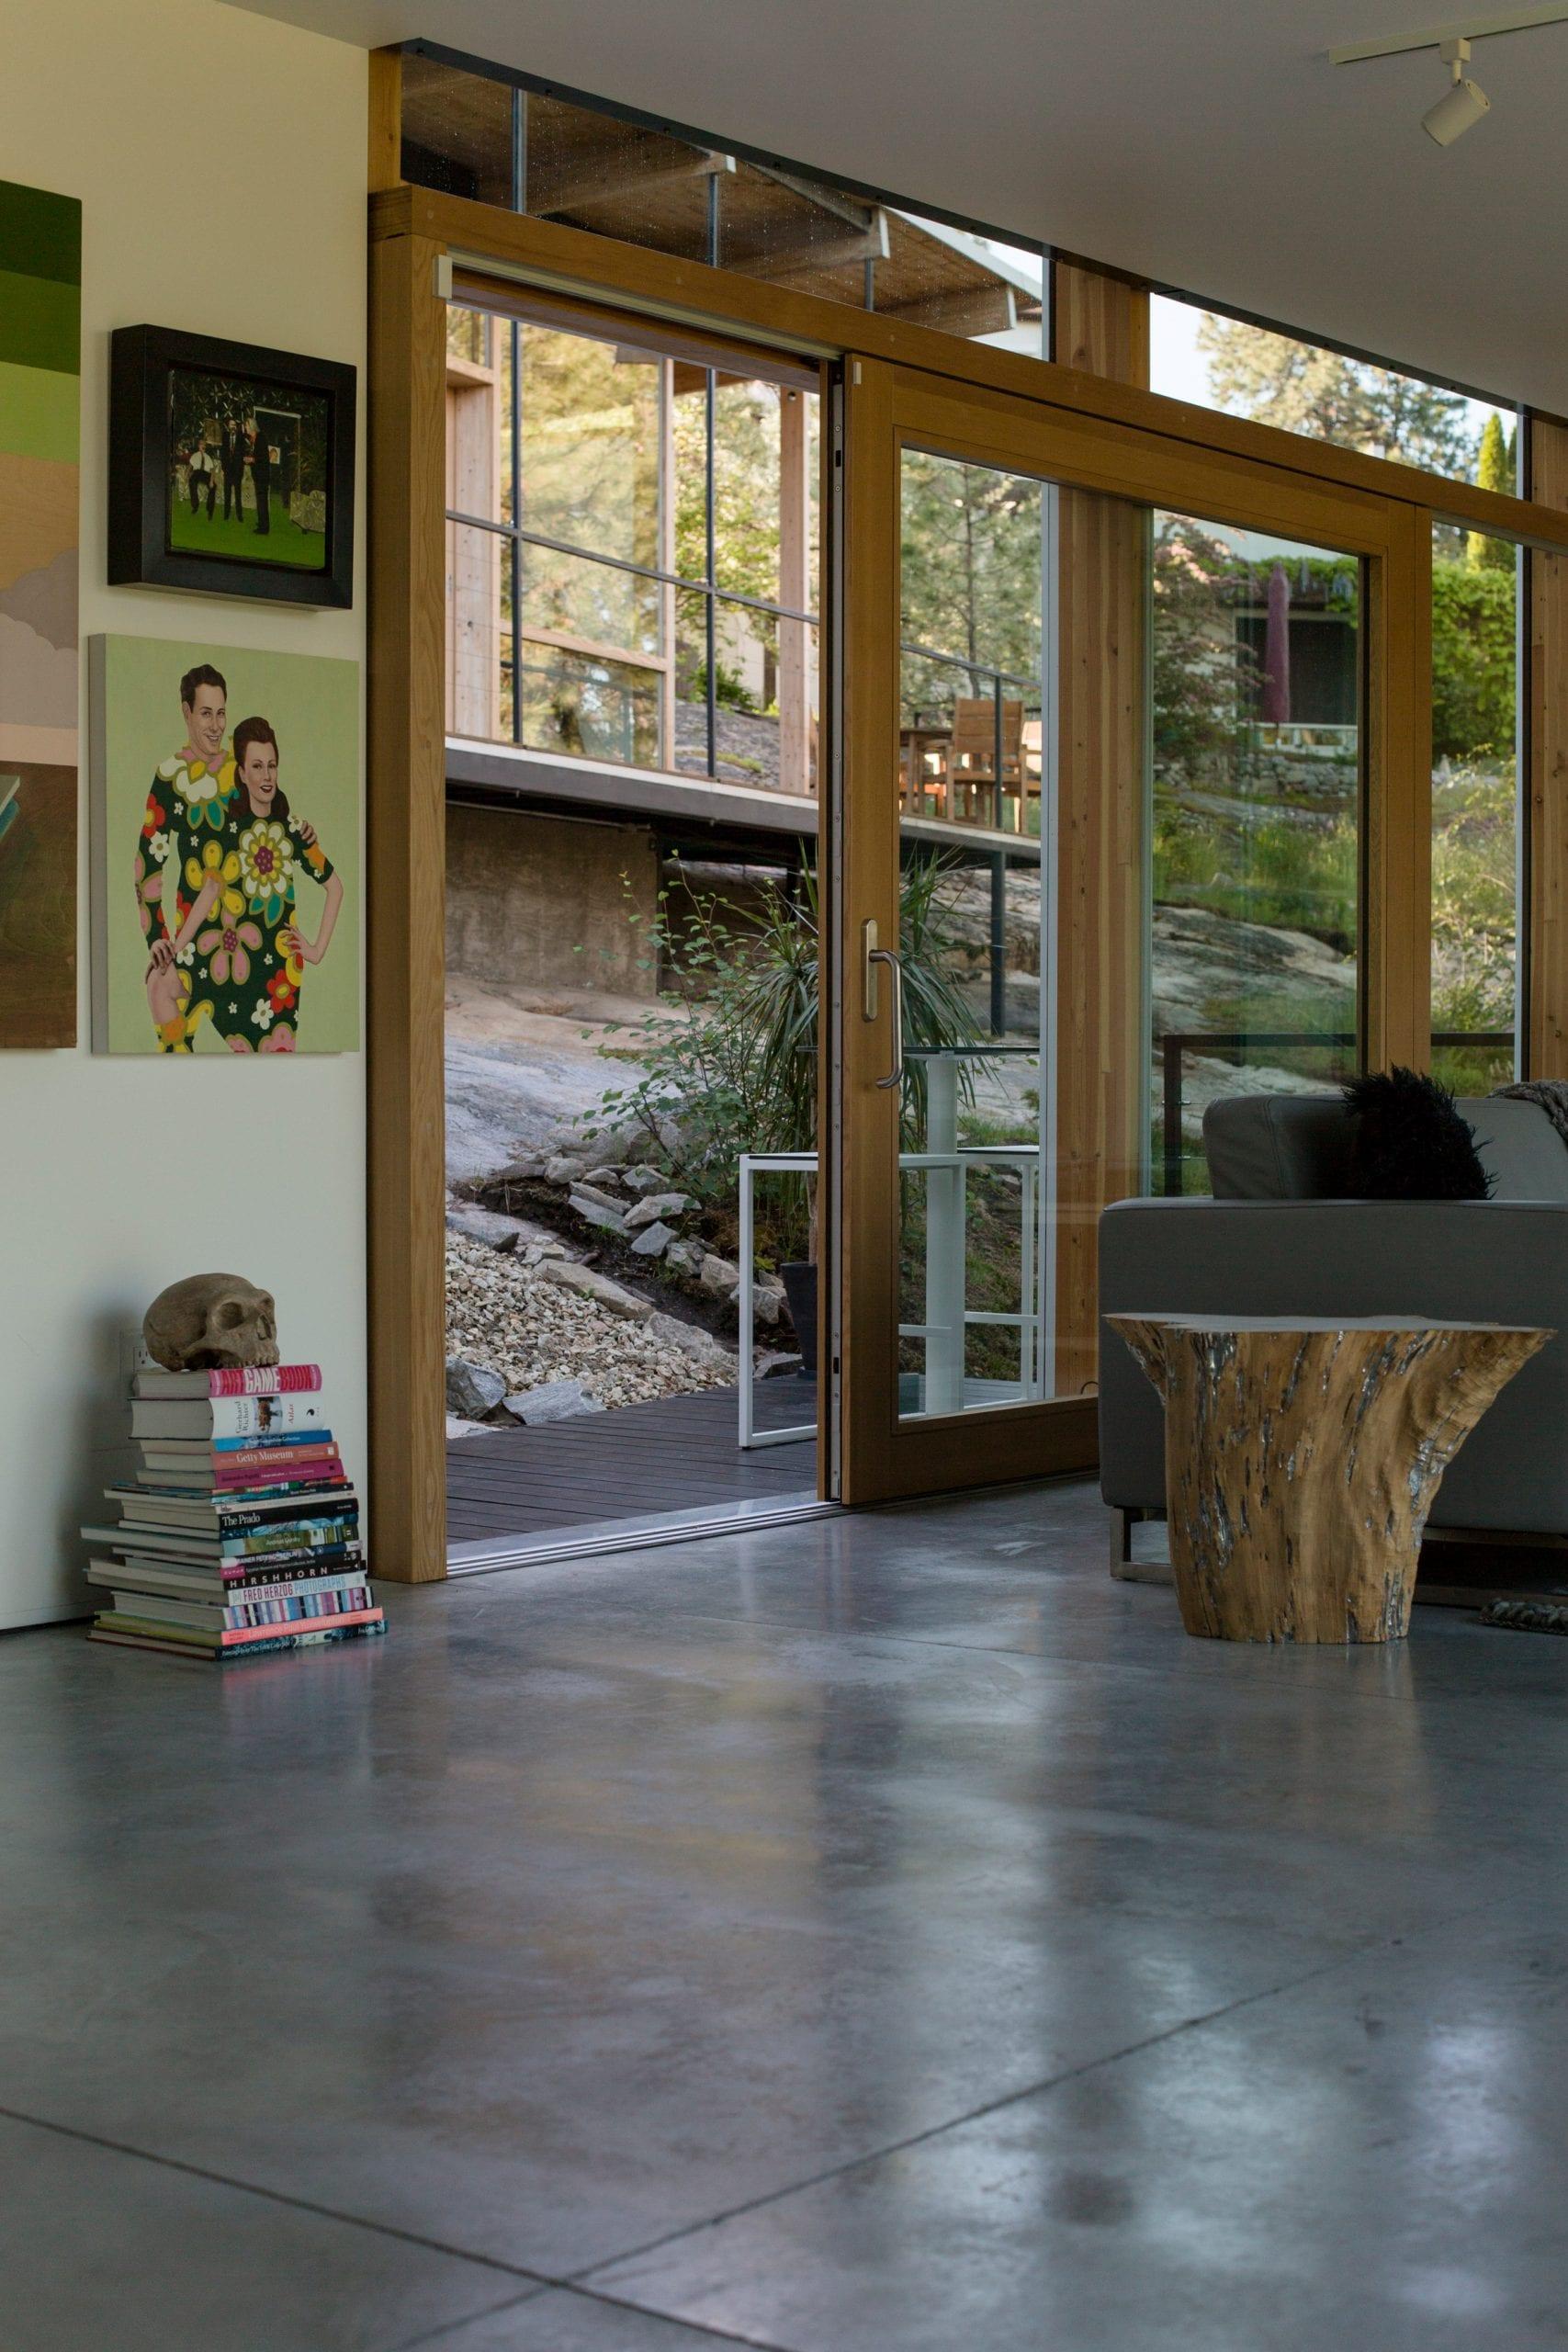 F2A Architecture incorporated wooden columns into the interior